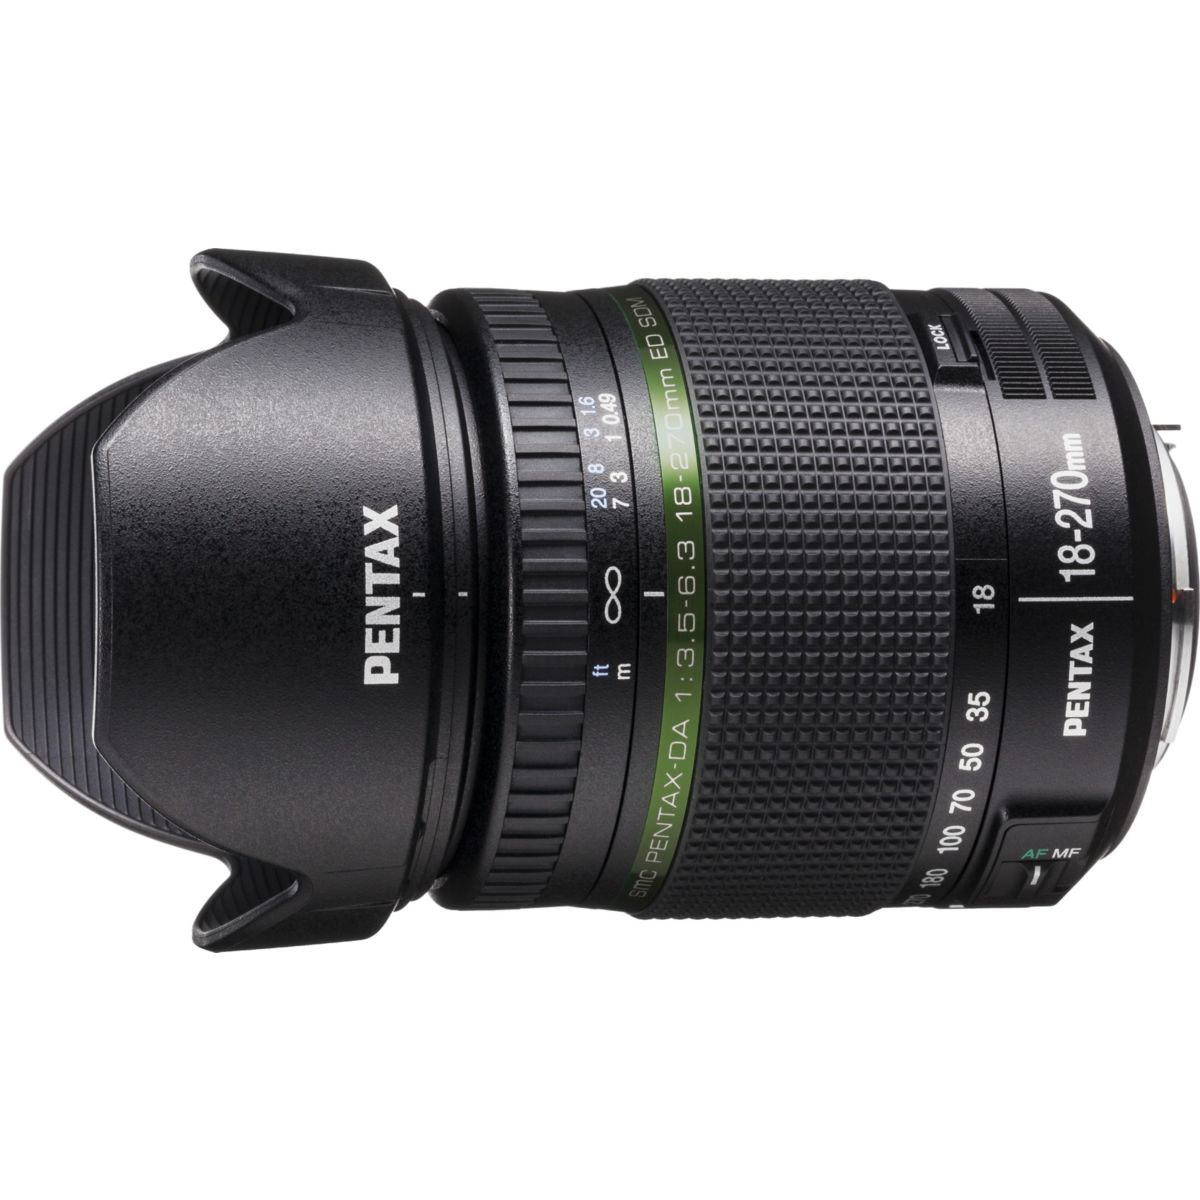 Objectif PENTAX DA 18-270mm f/3.5-6.3 SDM